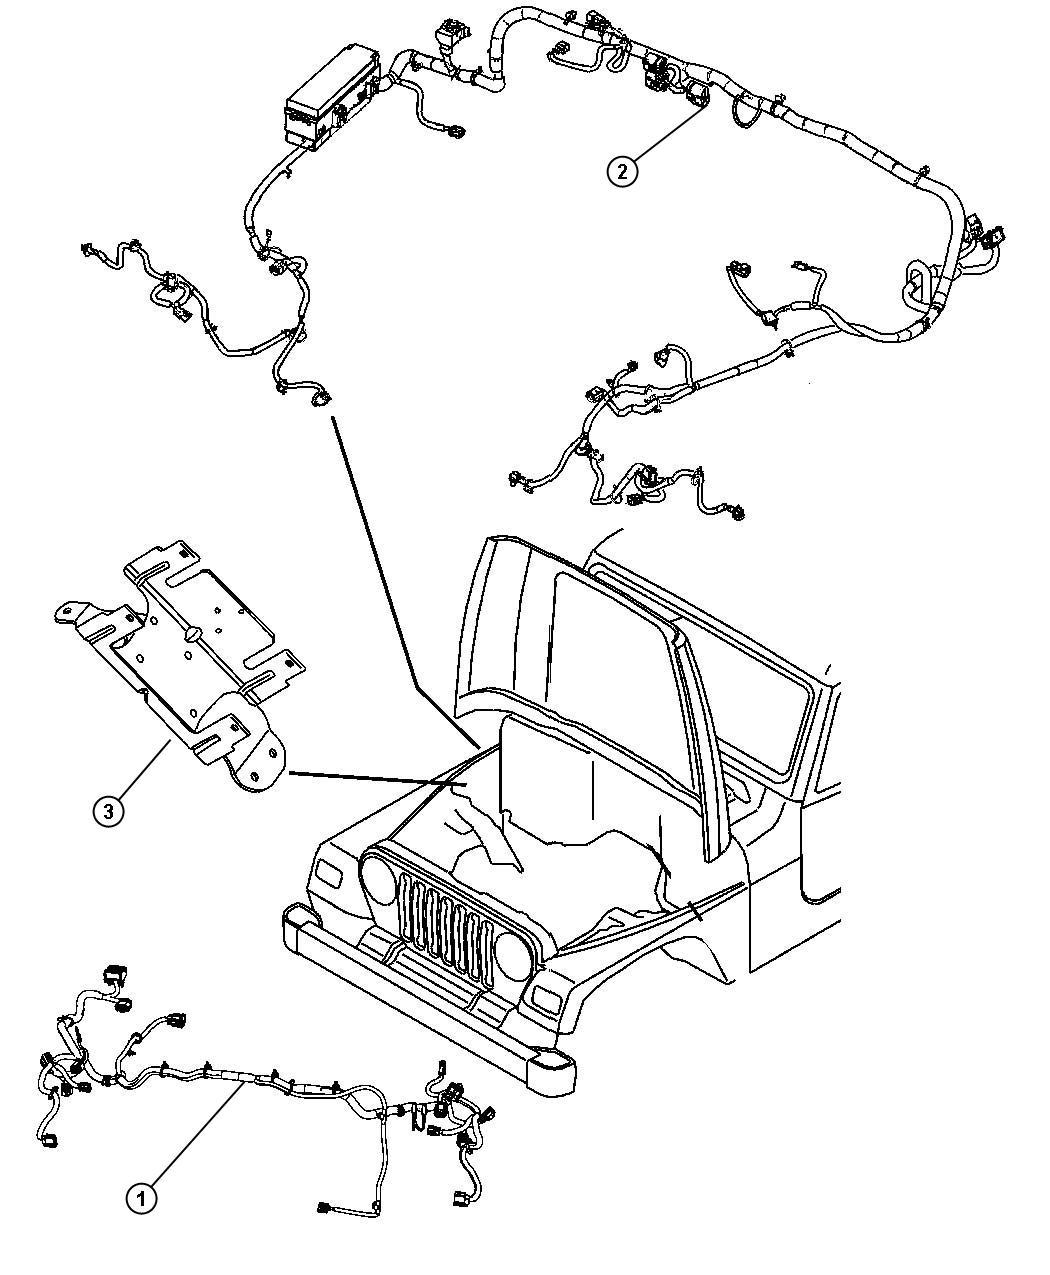 Jeep Wrangler Wiring. Dash. Automatic transmission